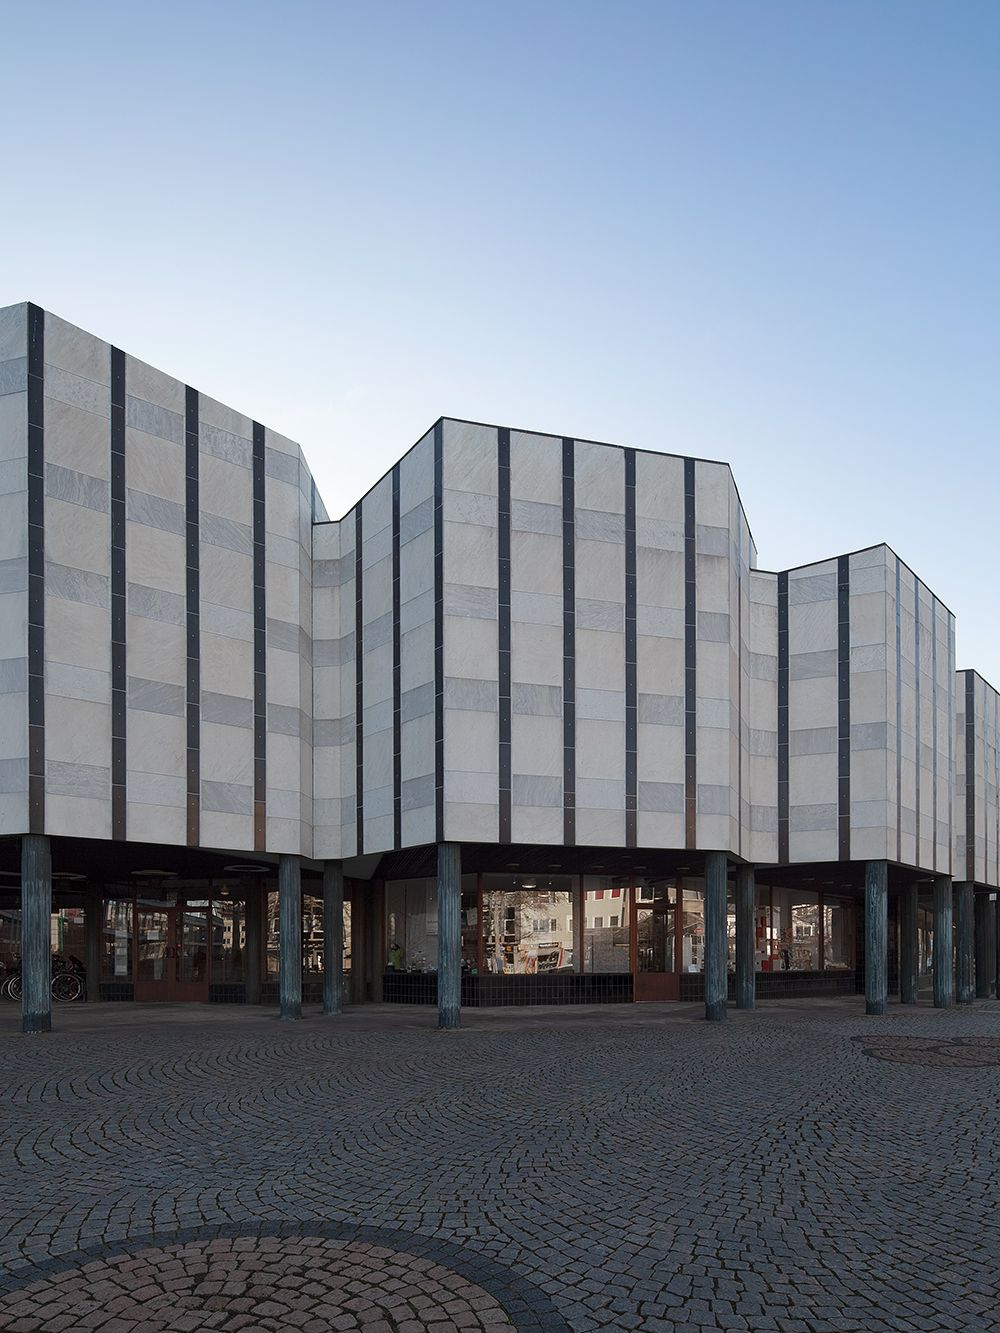 Alvar-Aalto-Kulturhaus, Wolfsburg